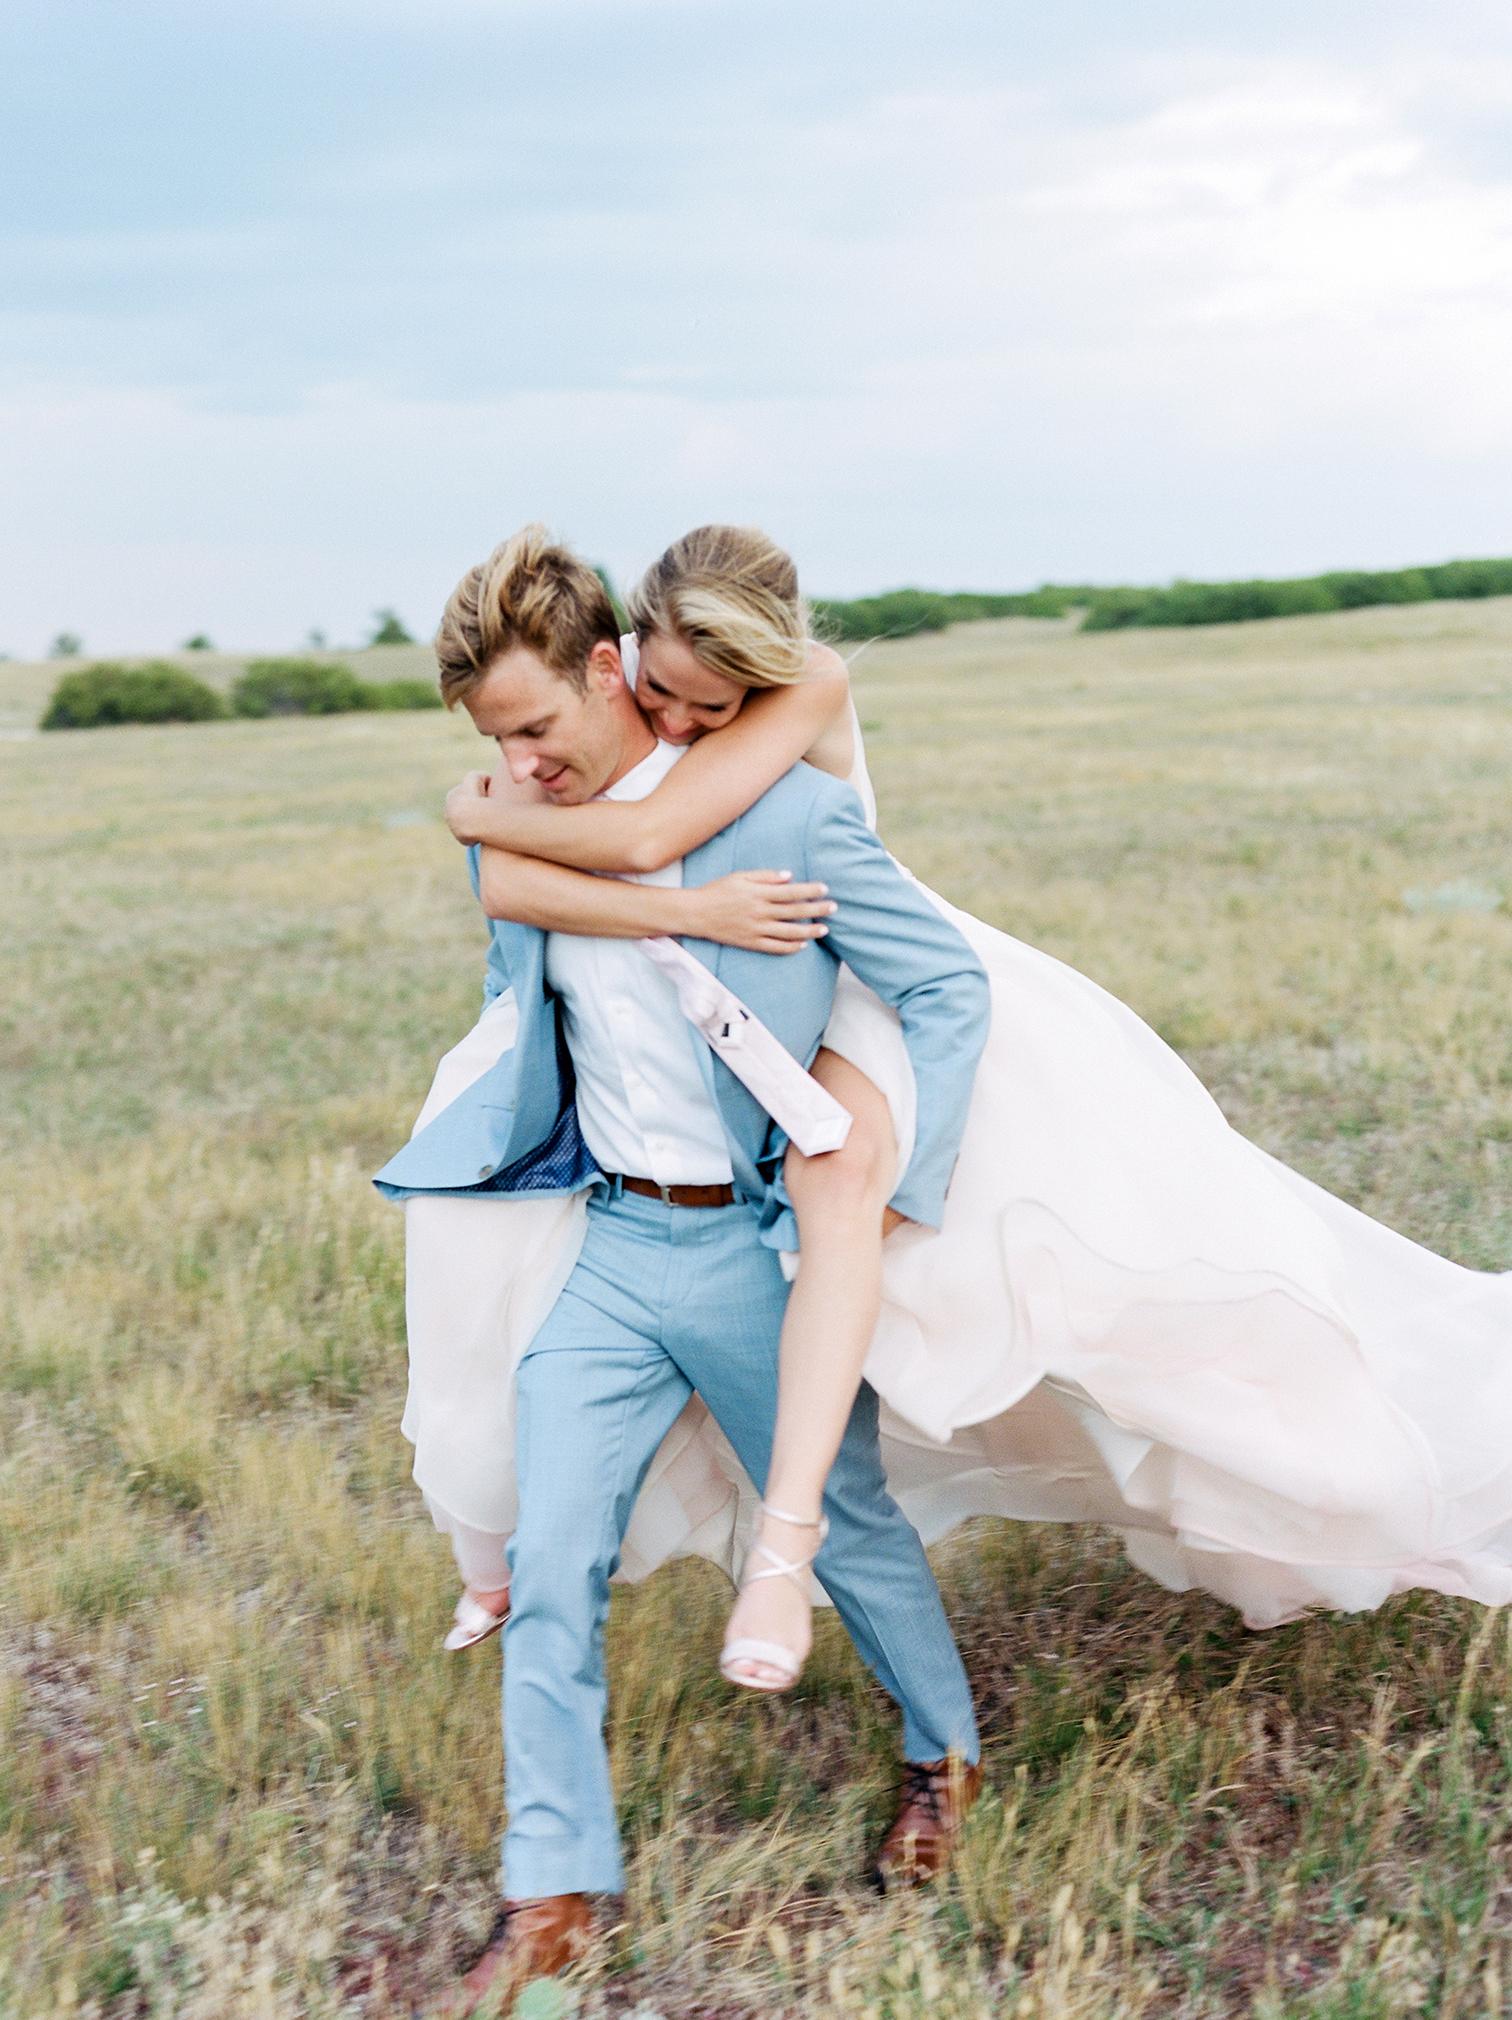 Wedding Photographers Colorado, Best Photography, Denver Wedding Photos, Groom Carrying Bride in Mountains, Fine Art film Photographers in Colorado